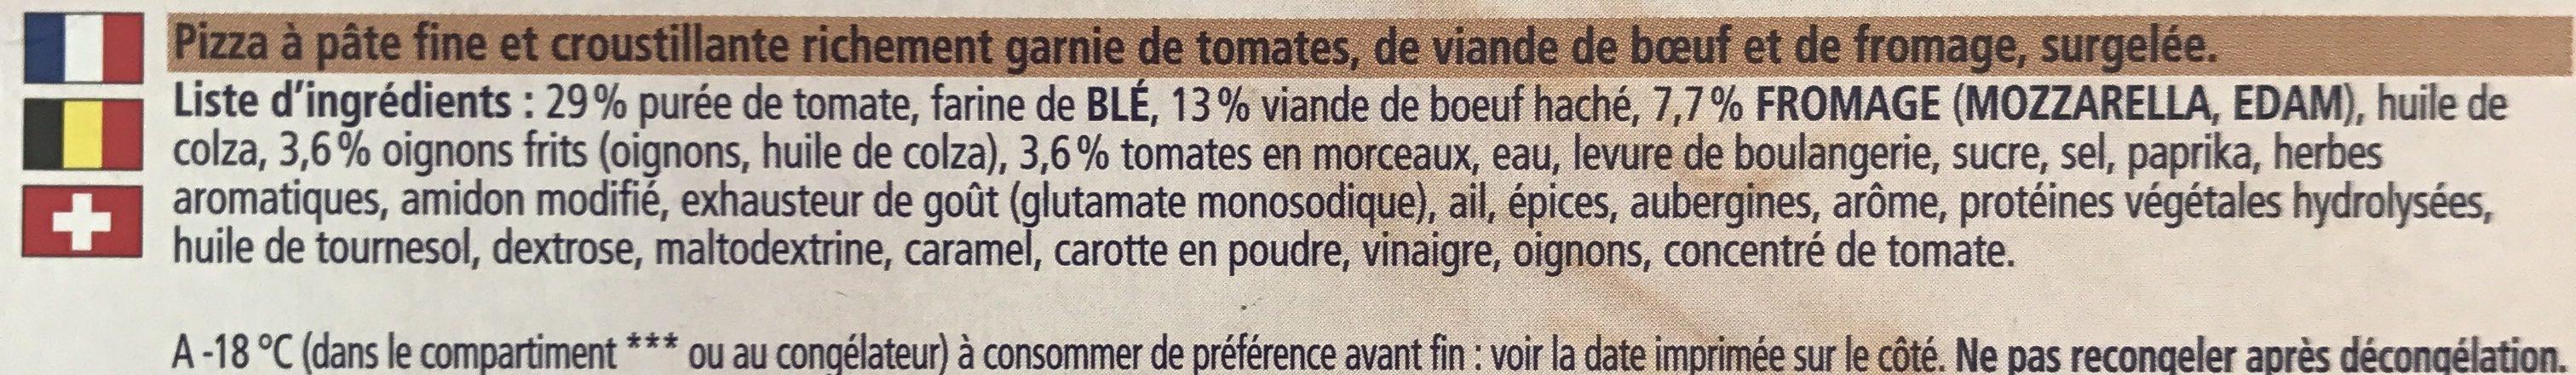 Ancel Rist Ristorante Bolognaise - Ingrediënten